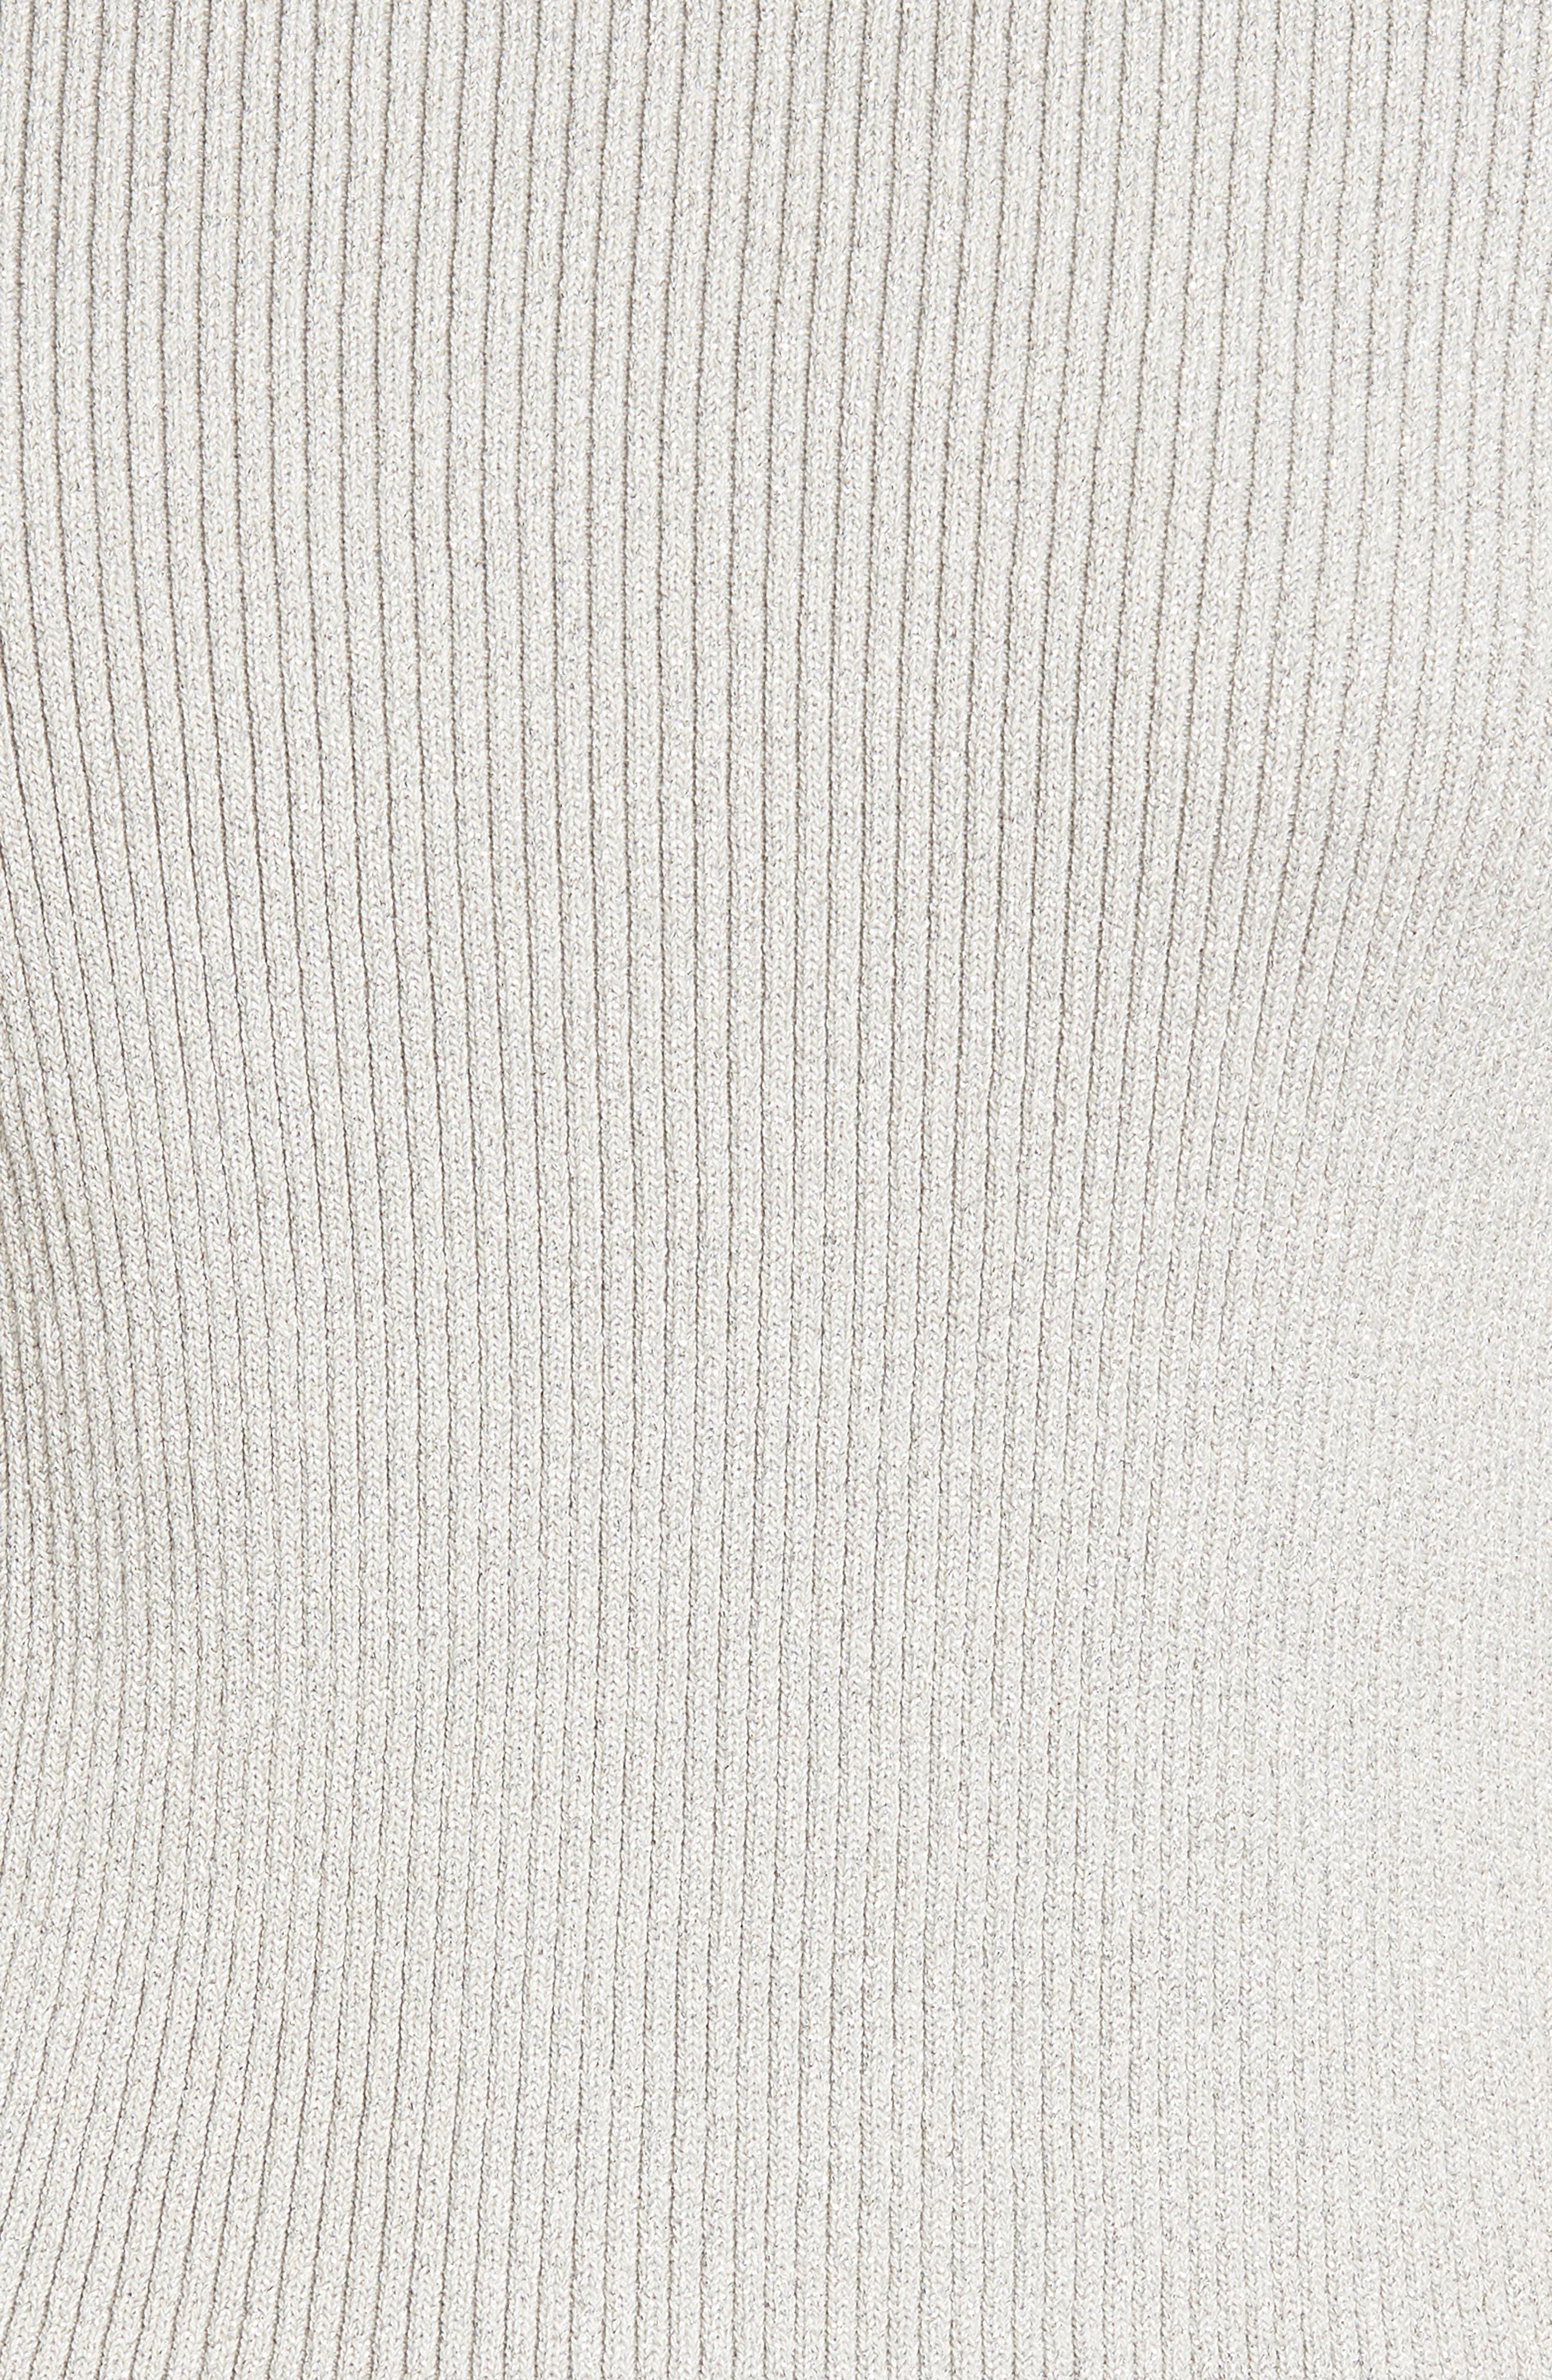 Elbow Sleeve Mock Neck Sweater,                             Alternate thumbnail 5, color,                             LIGHT GRAY